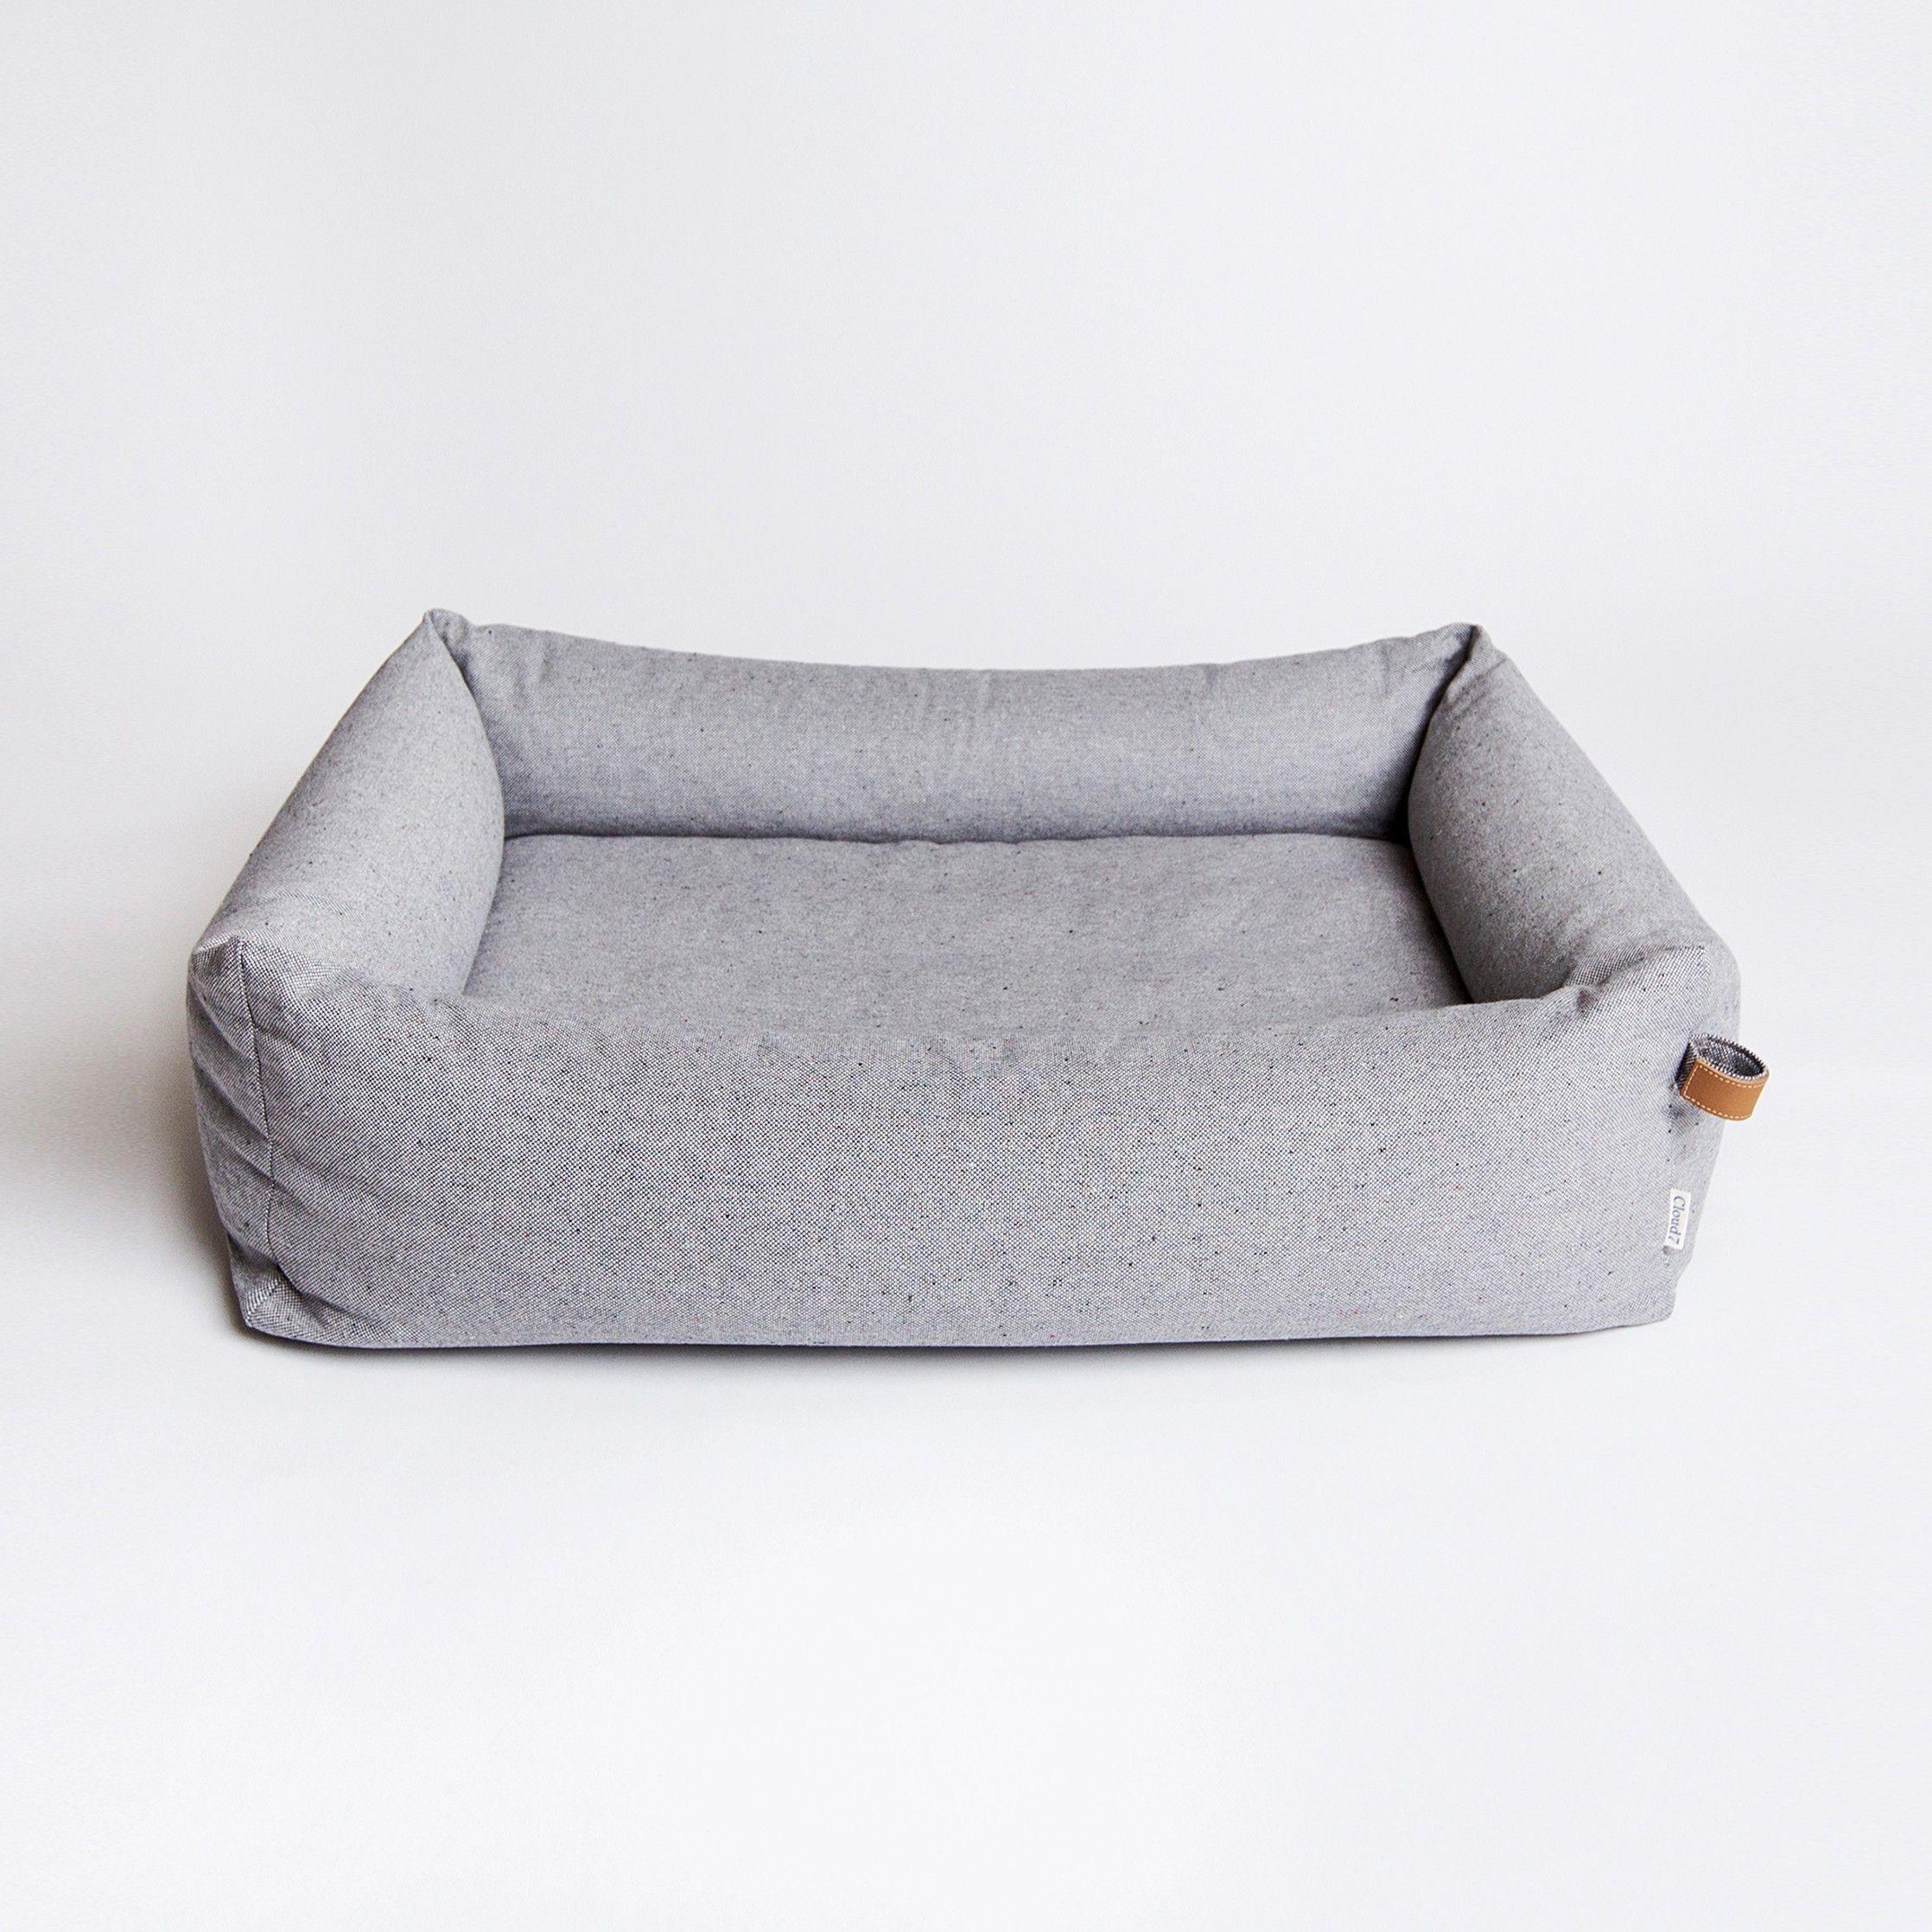 Hundebett Sleepy Deluxe Tweed Grey | Bolonka und Hunde